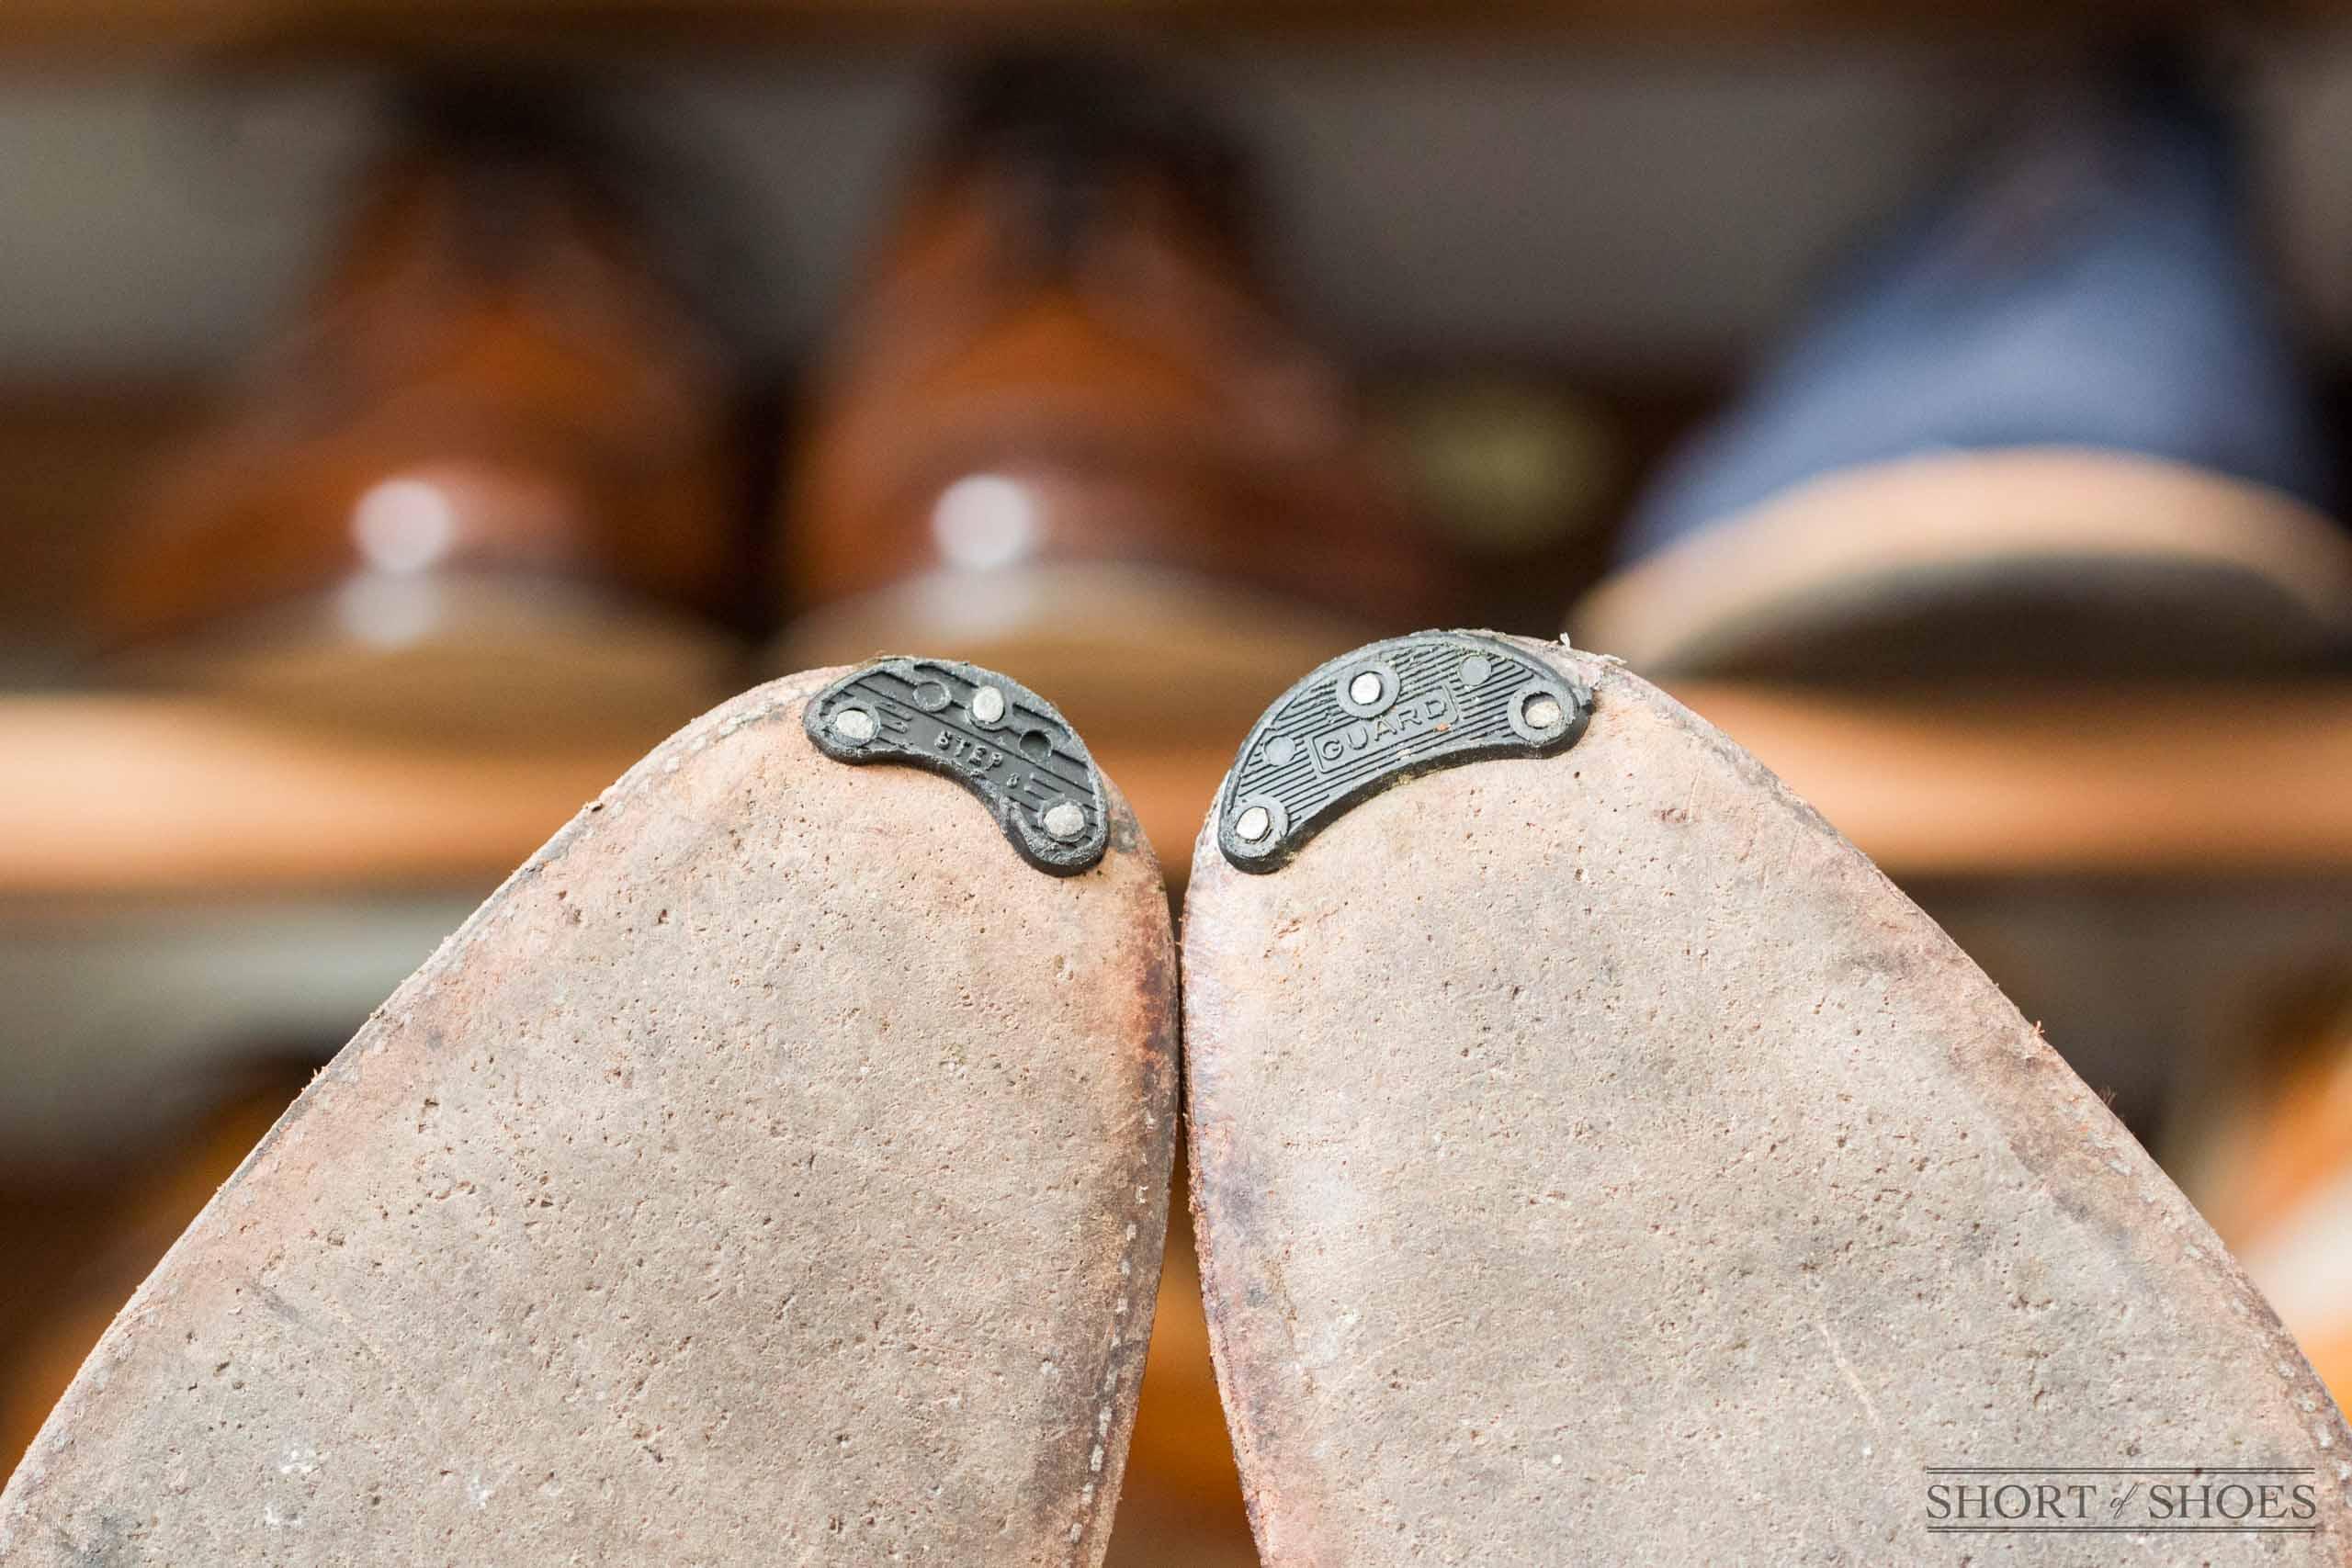 toe taps shoes style guru fashion glitz